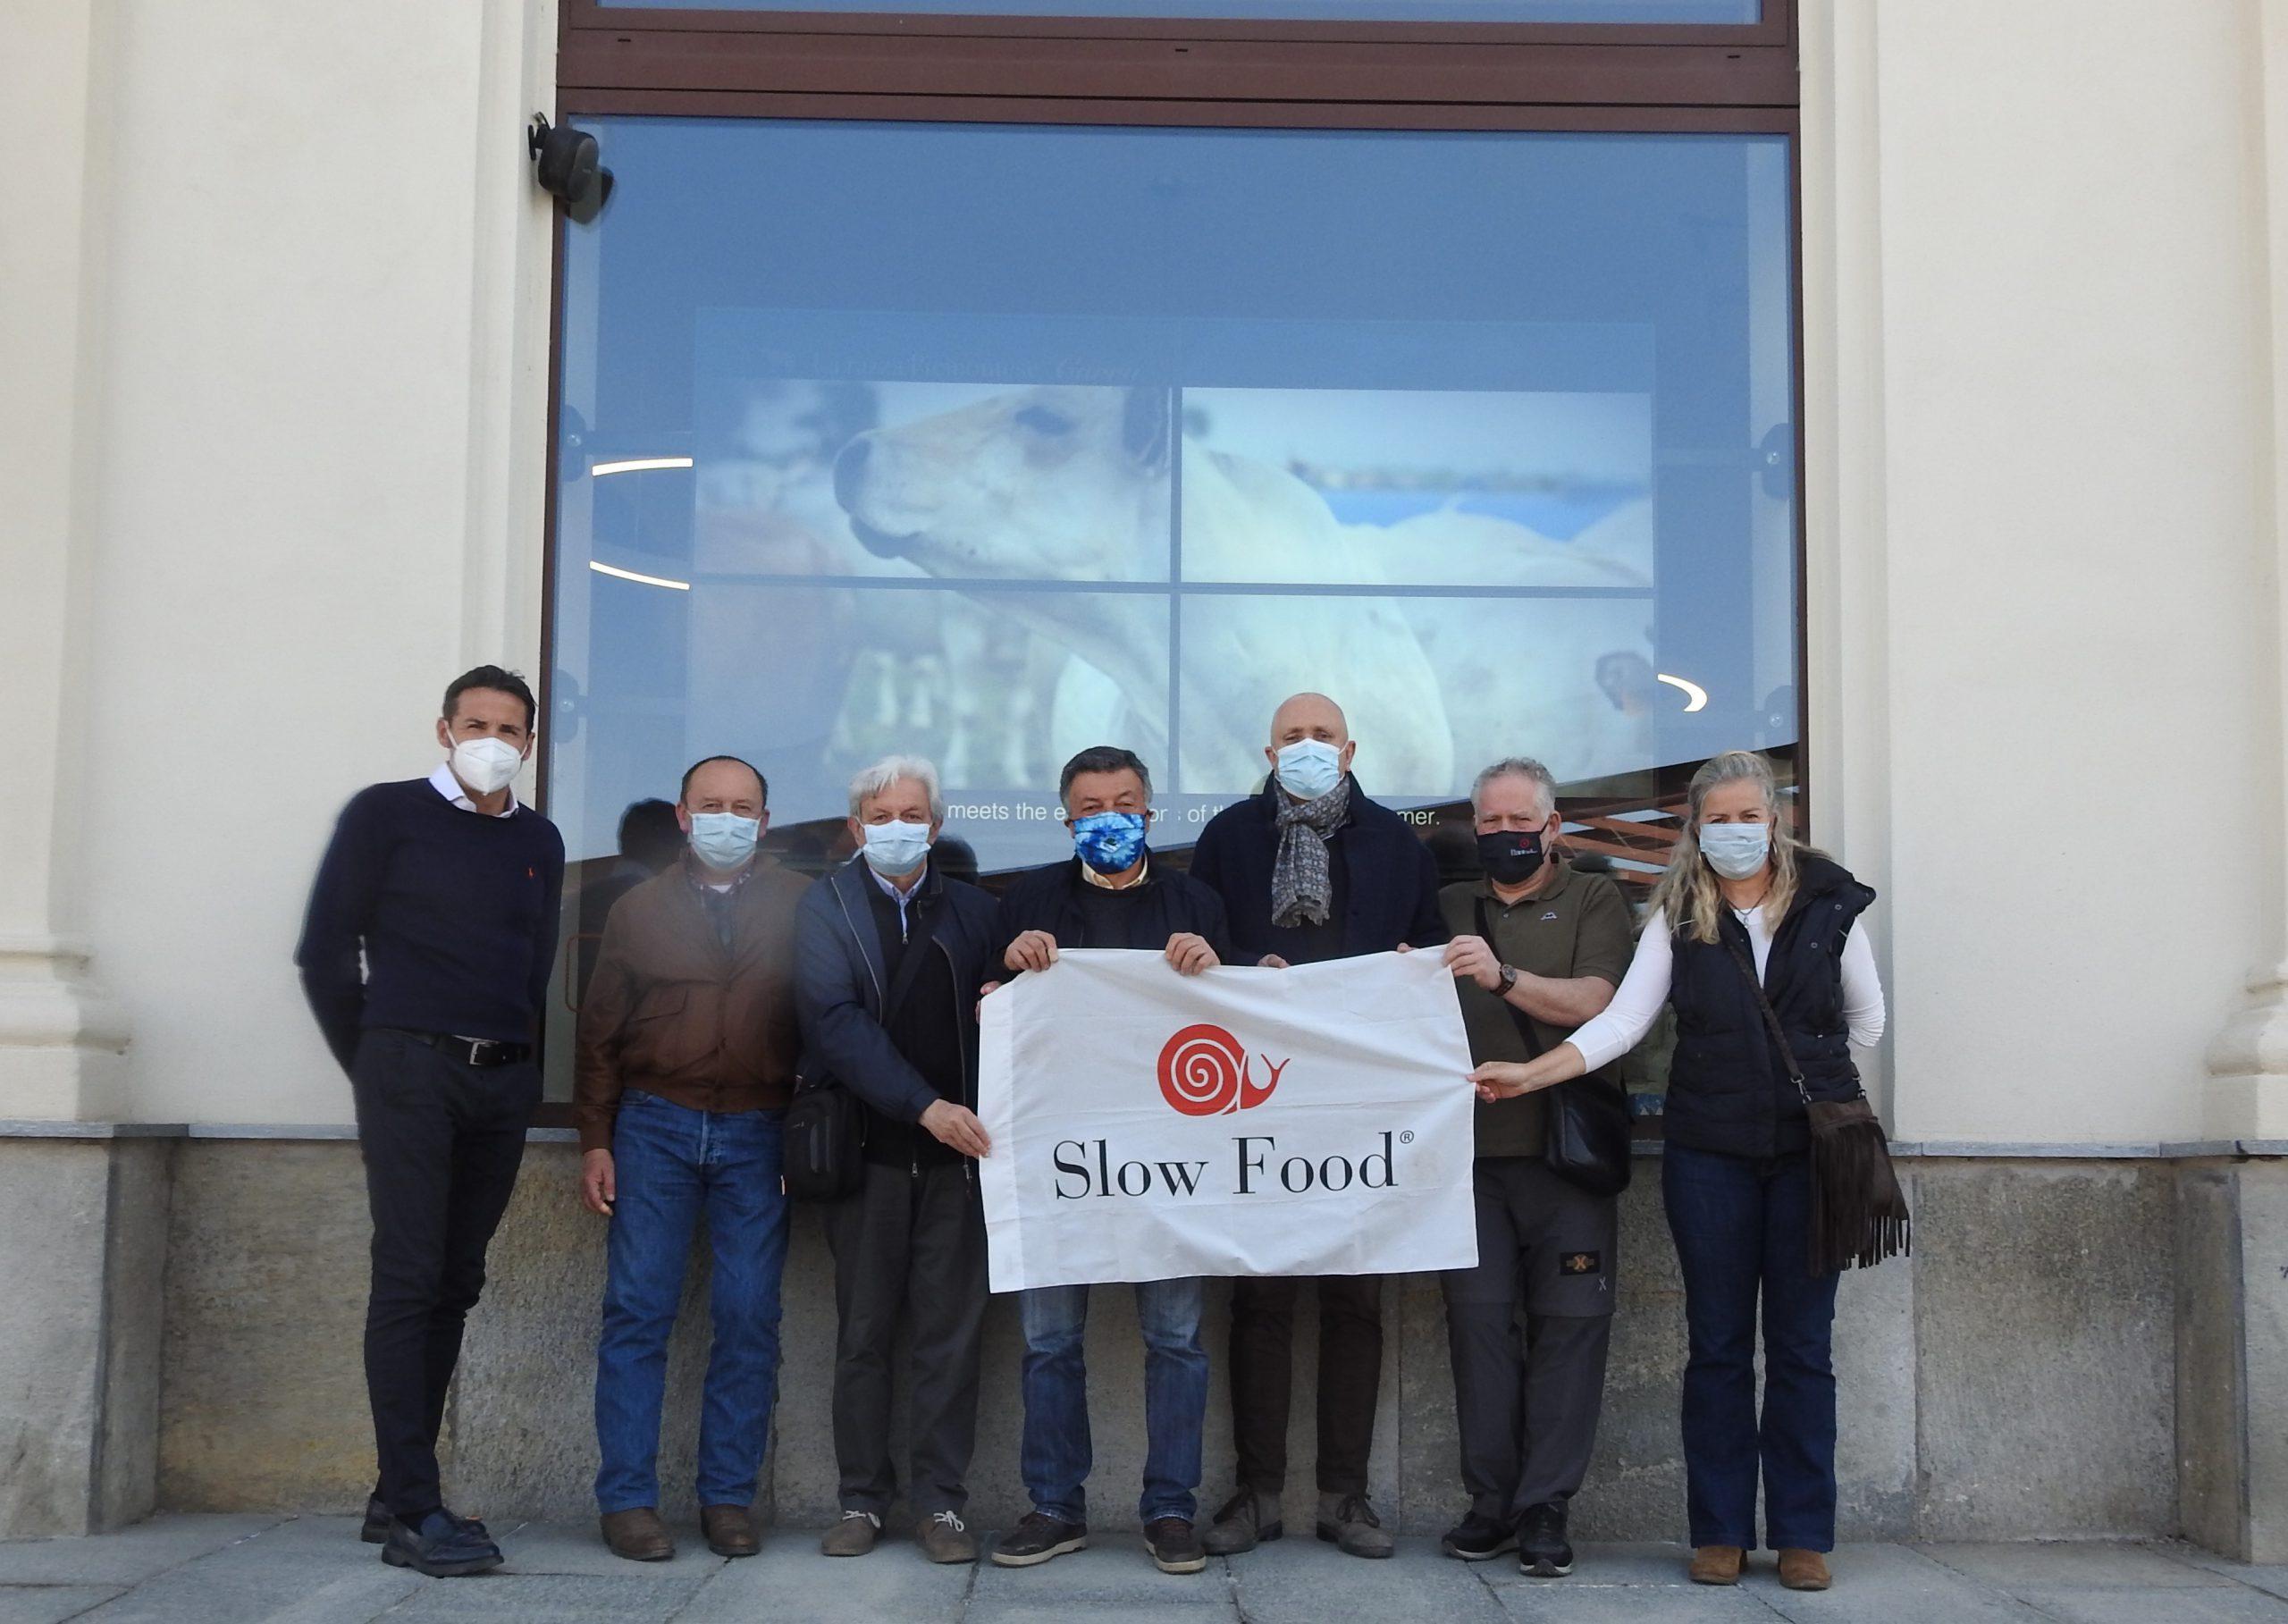 Comitato Slow Food Cuneo e Valli